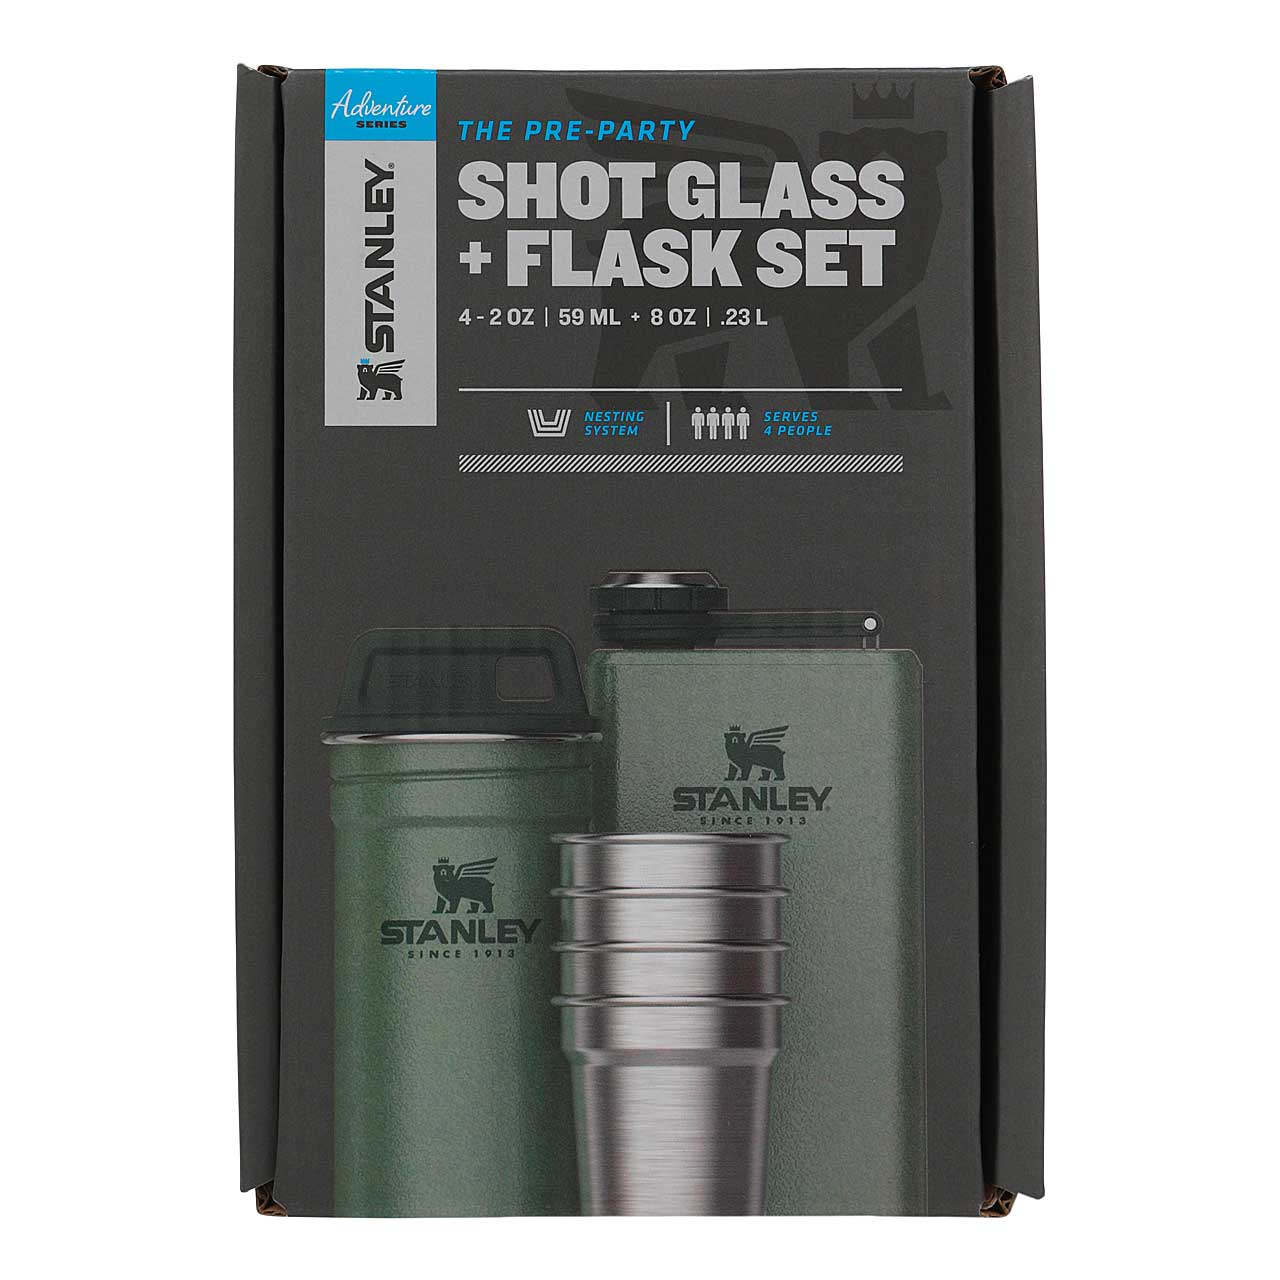 Stanley ADVENTURE SHOT & FLASK GIFT SET 236 ml